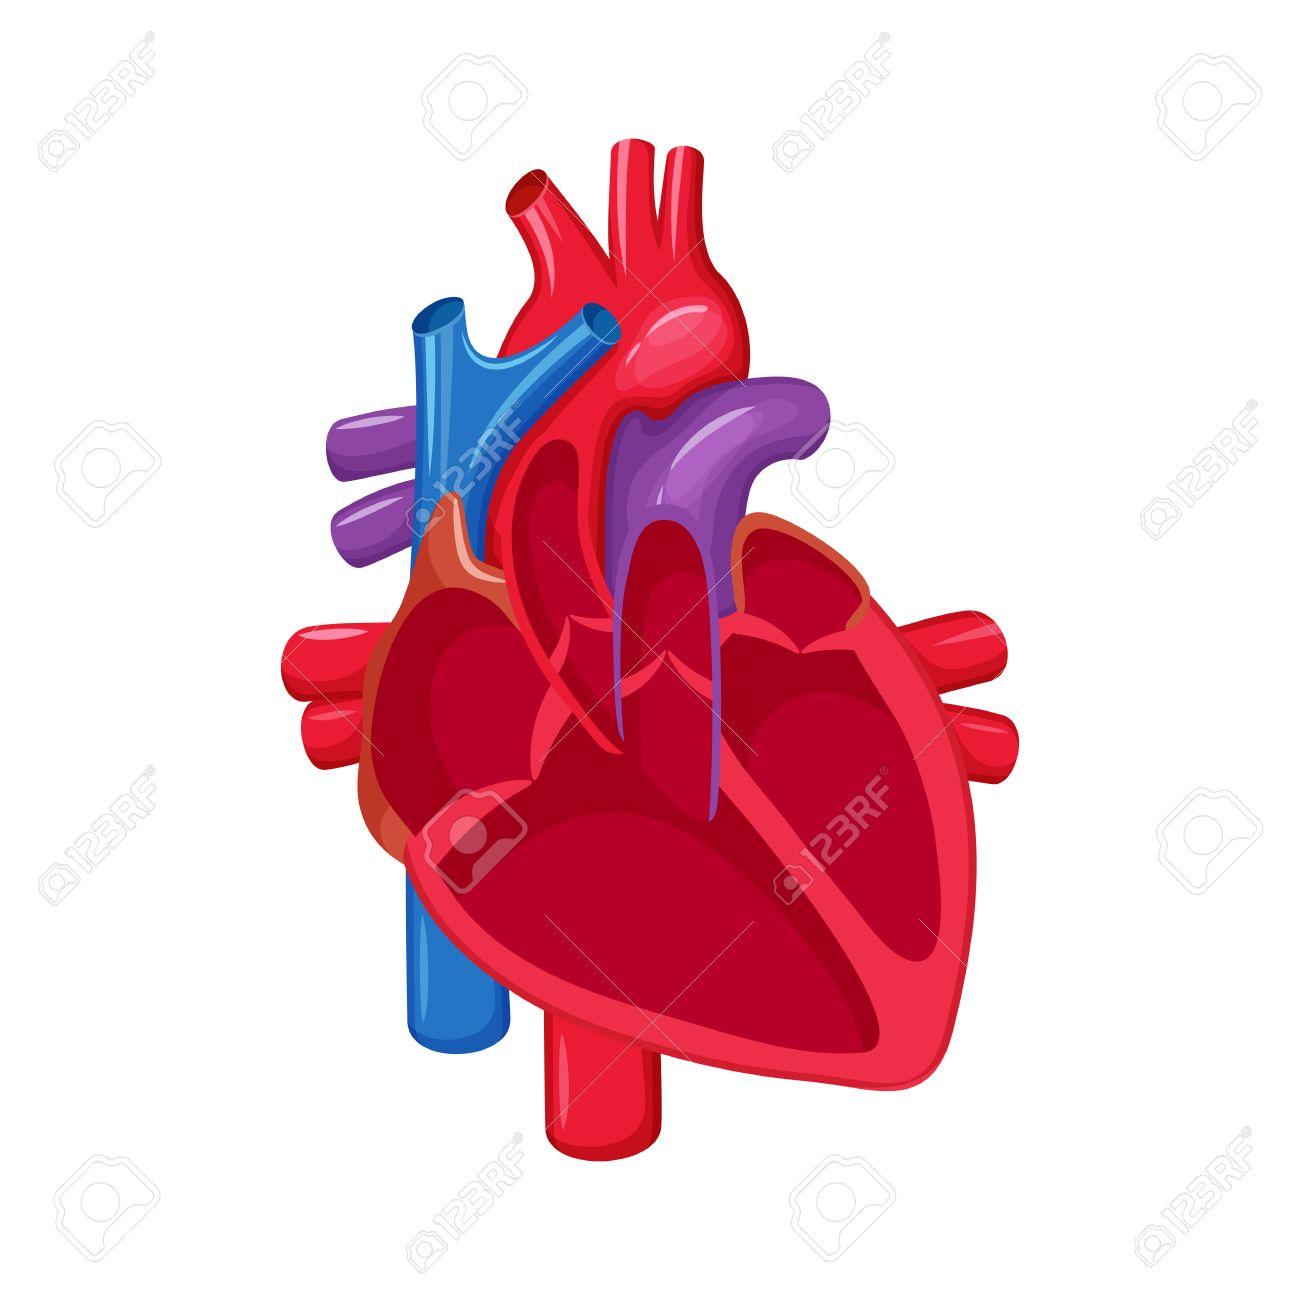 Human Heart Anatomy Heart Medical Science Vector Illustration